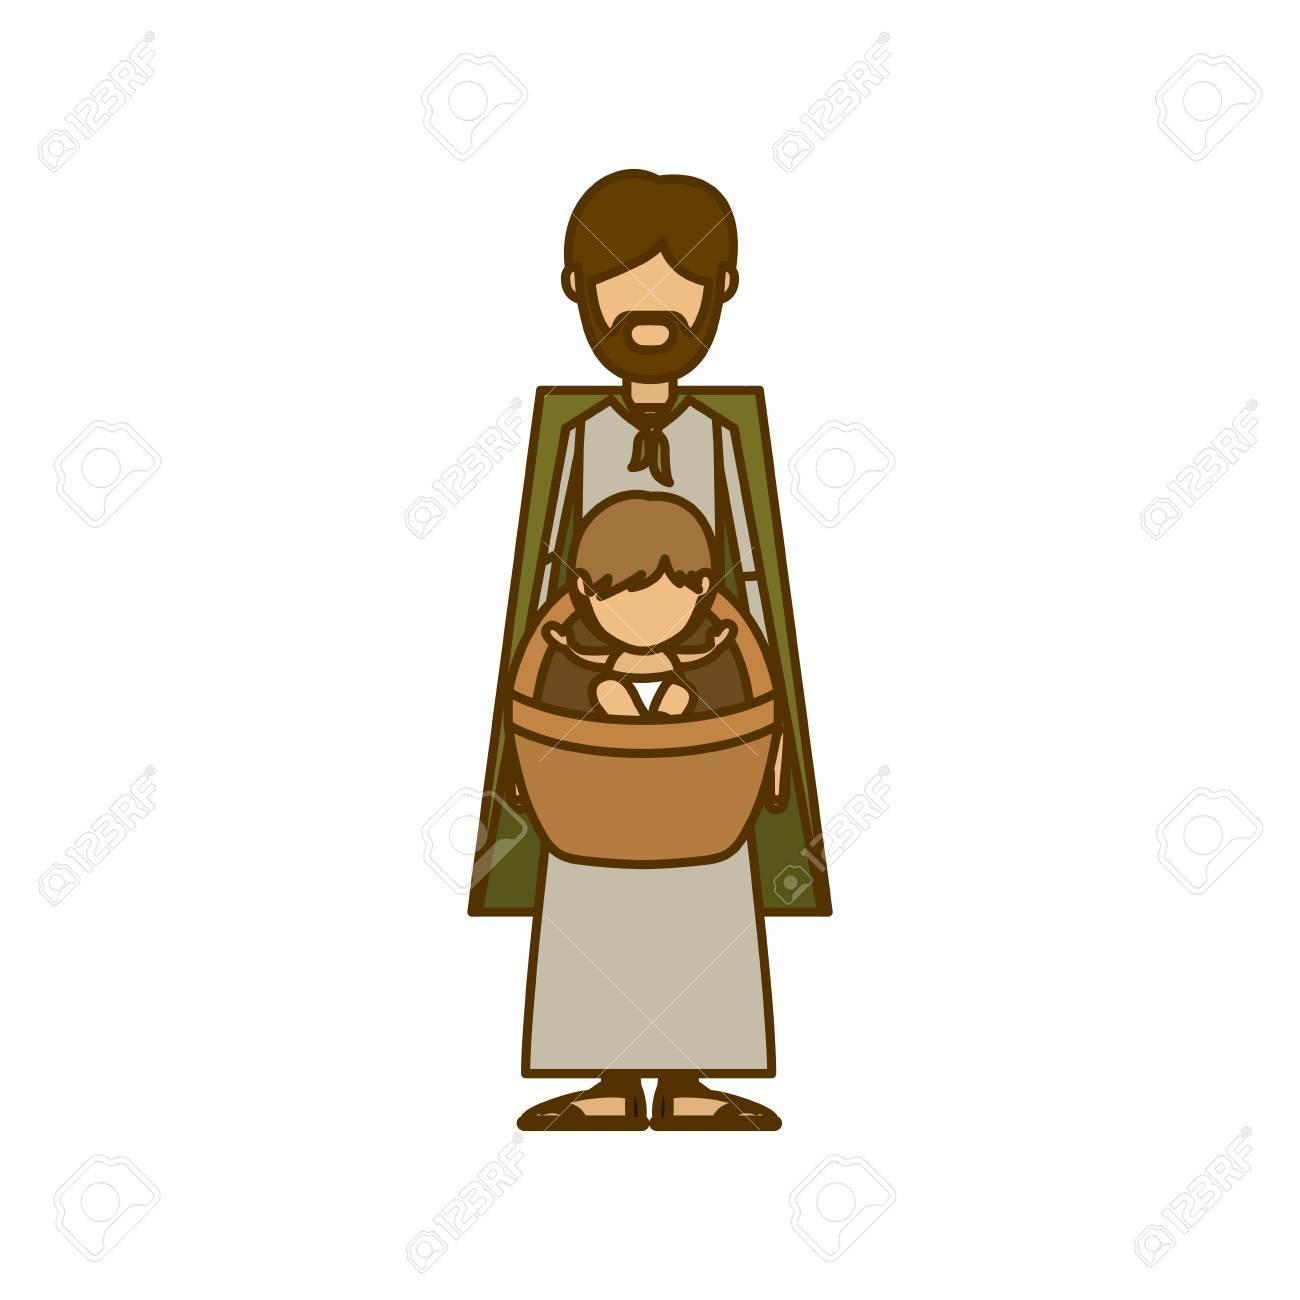 1300x1300 Holy Joseph And Baby Jesus Icon. Nativity Merry Christmas Season